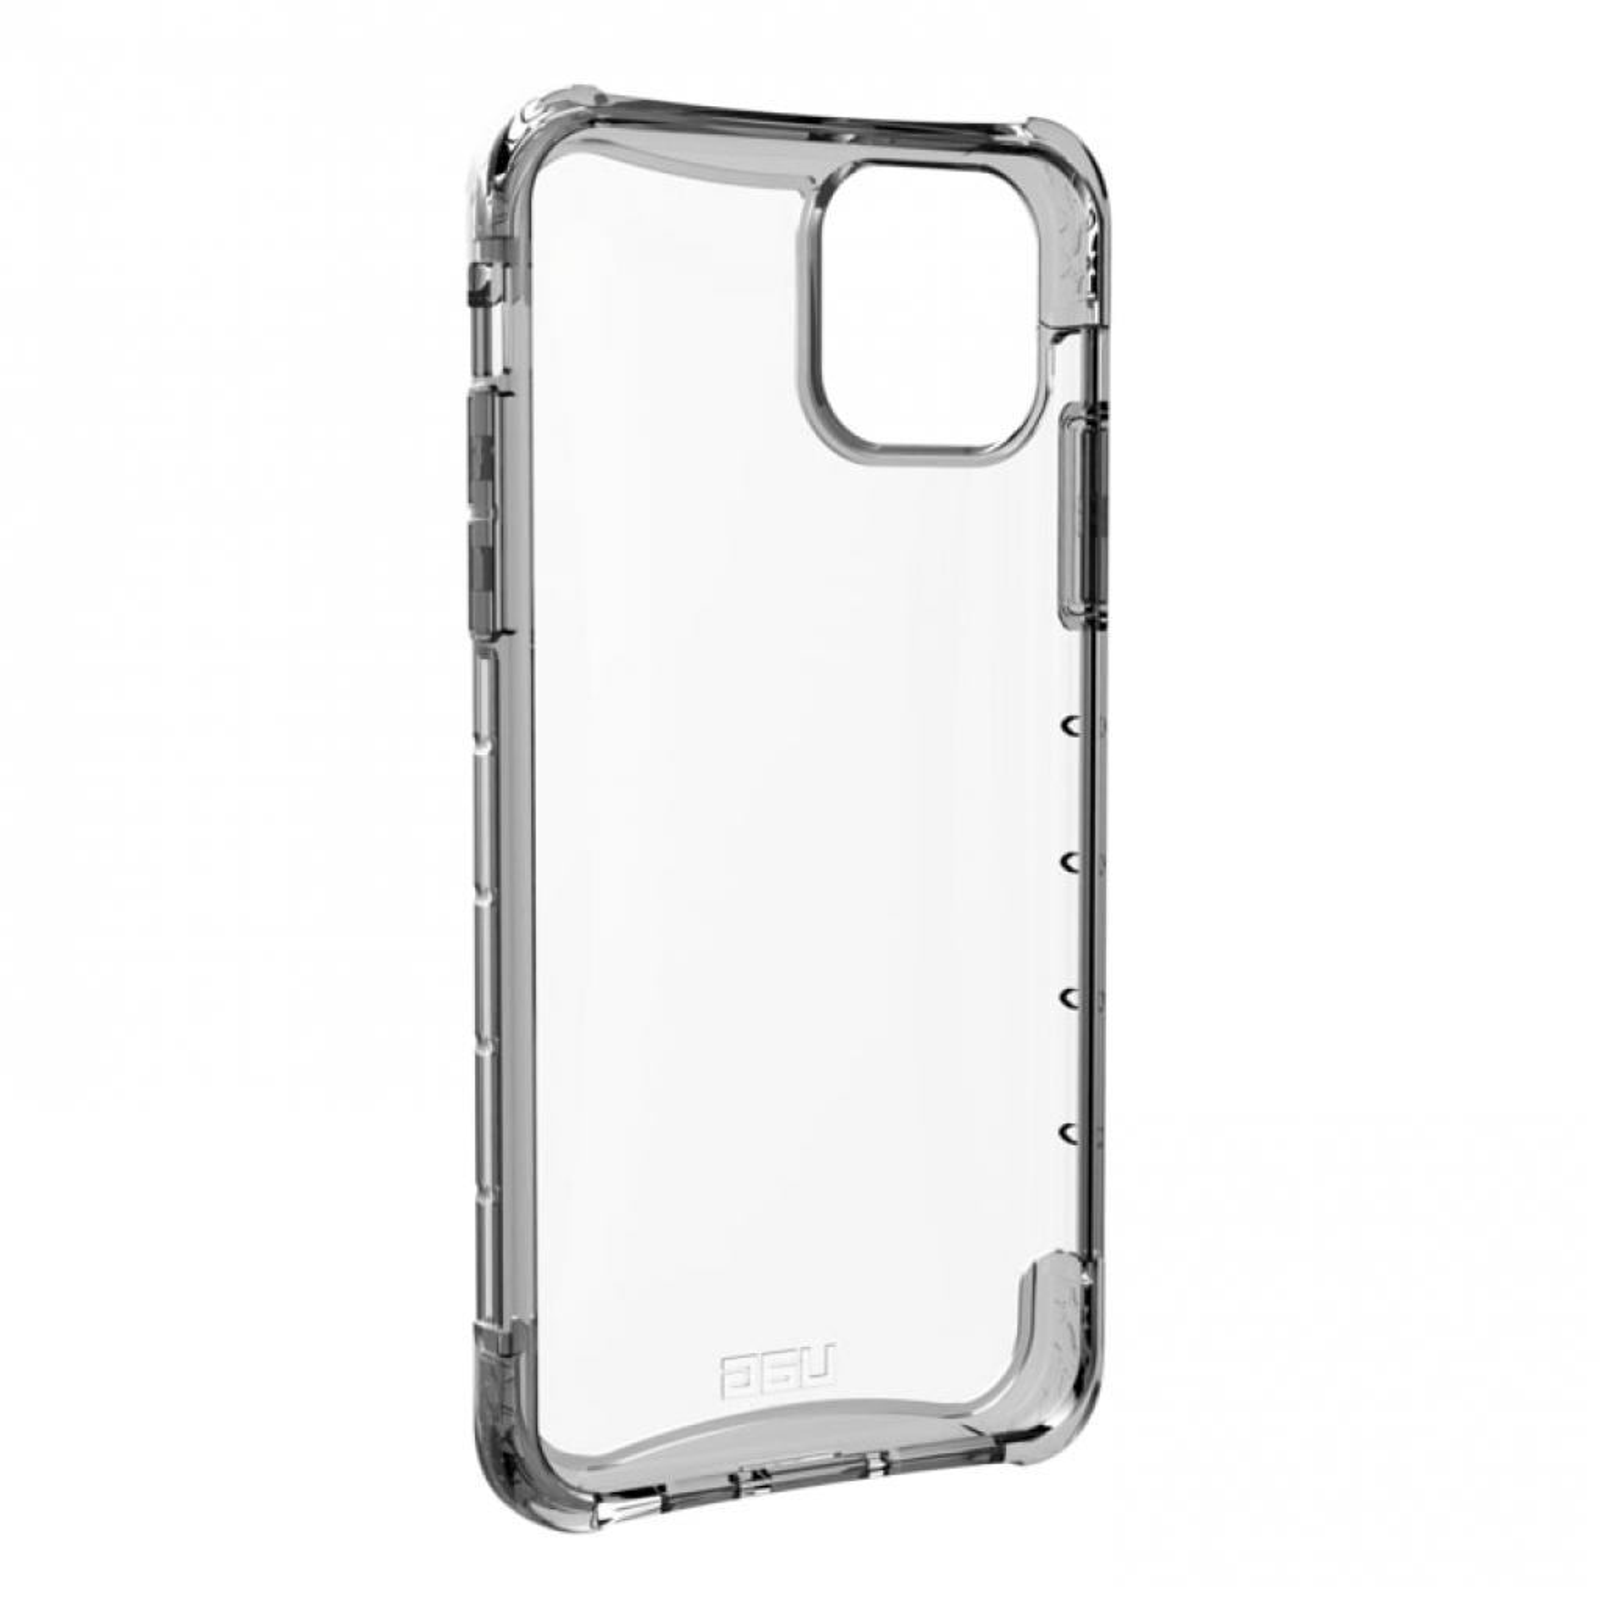 Чехол для моб. телефона Uag iPhone 11 Pro Max Plyo, Ice (111722114343) изображение 4